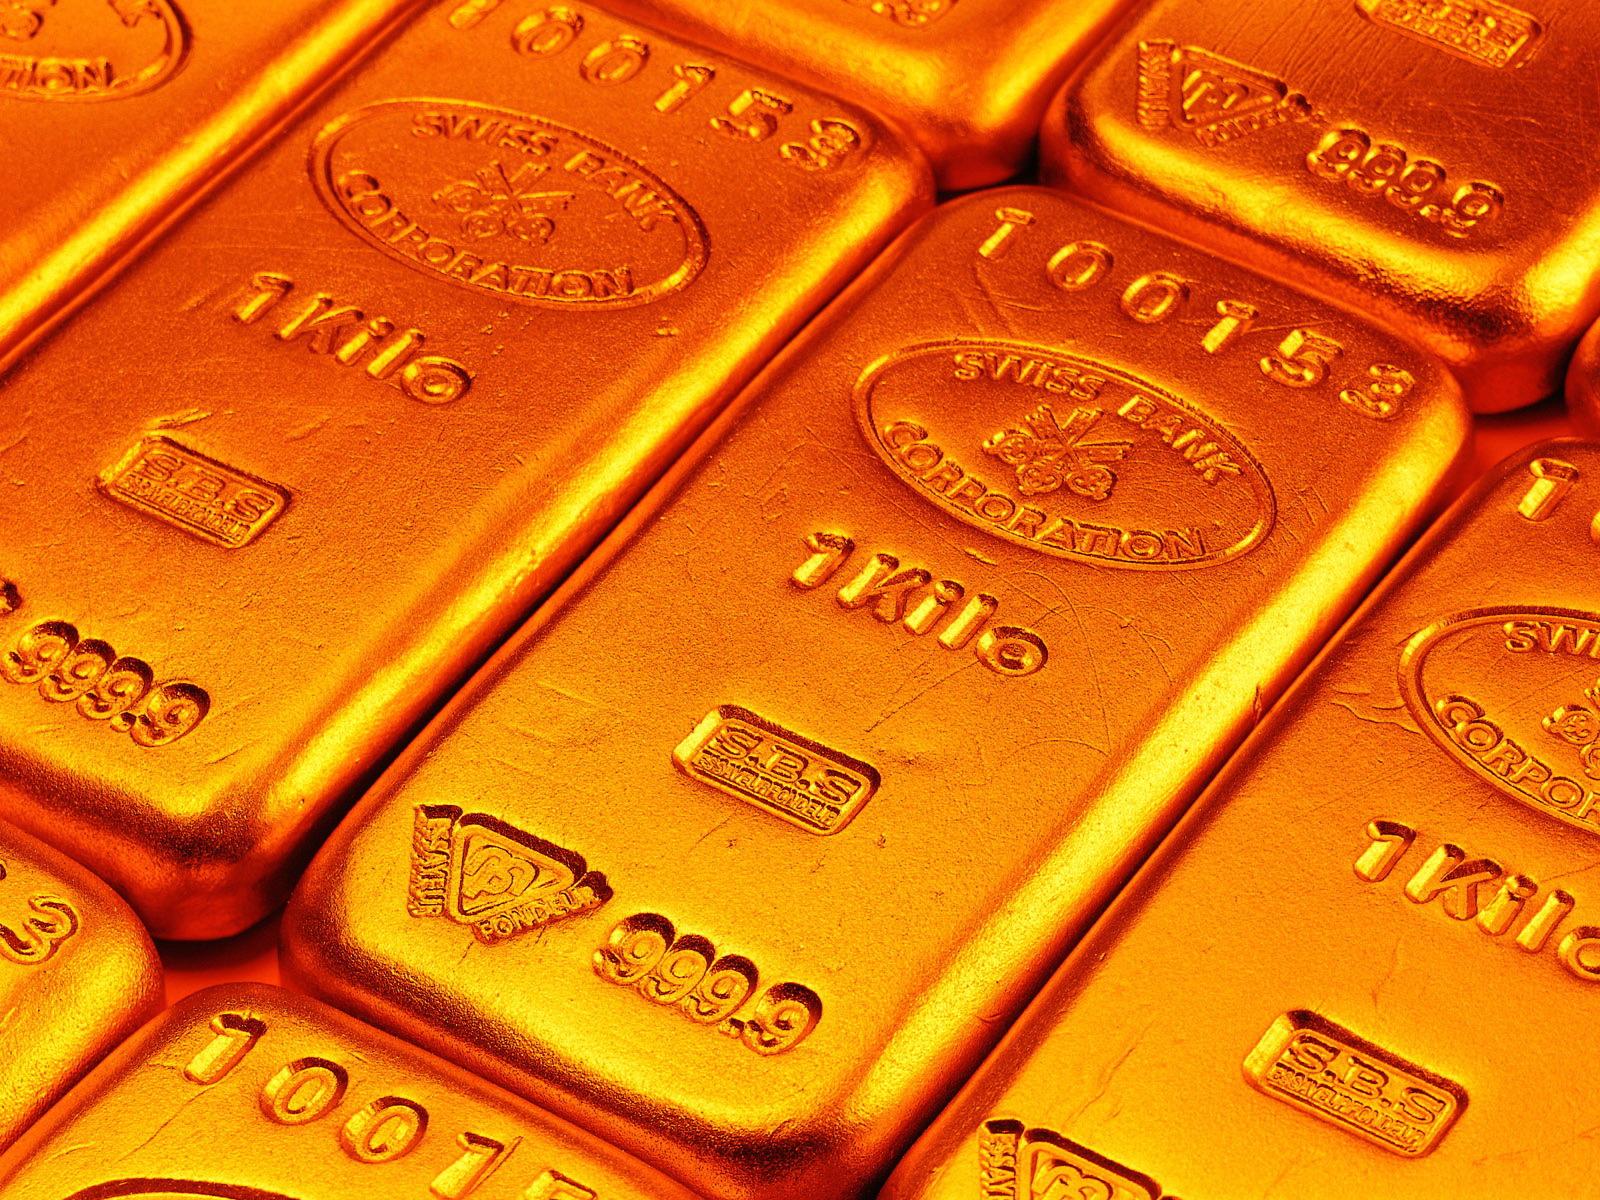 http://4.bp.blogspot.com/-R1WOSTHkUsA/UF4UR_ePkgI/AAAAAAAAAOM/inEkn-ntdyA/s1600/financial_Wallpaper_Gold_1-One_kilogram-ingot.jpg